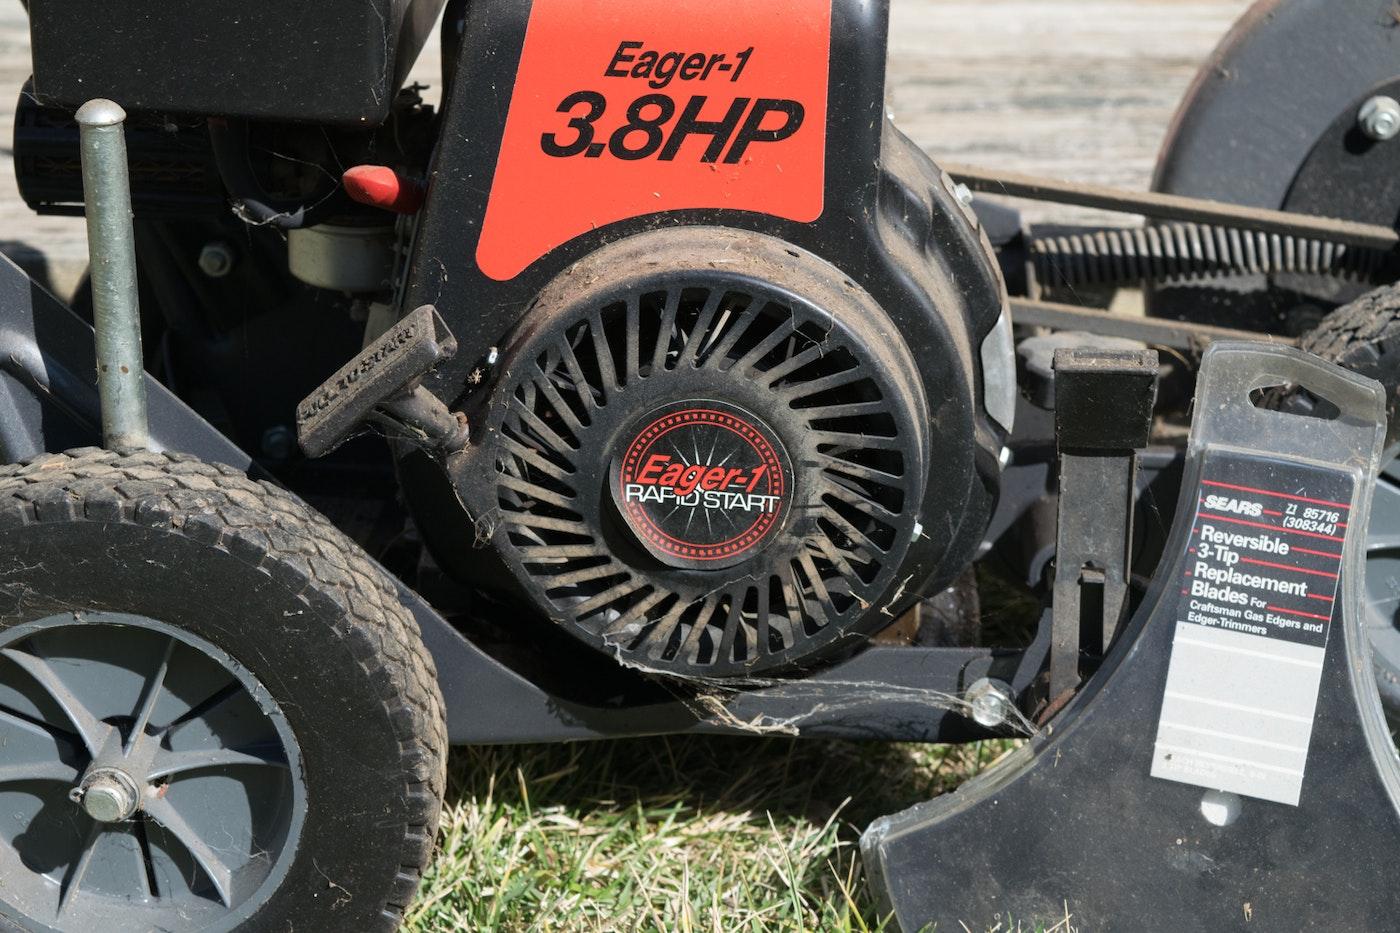 craftsman 3 hp electric edger manual